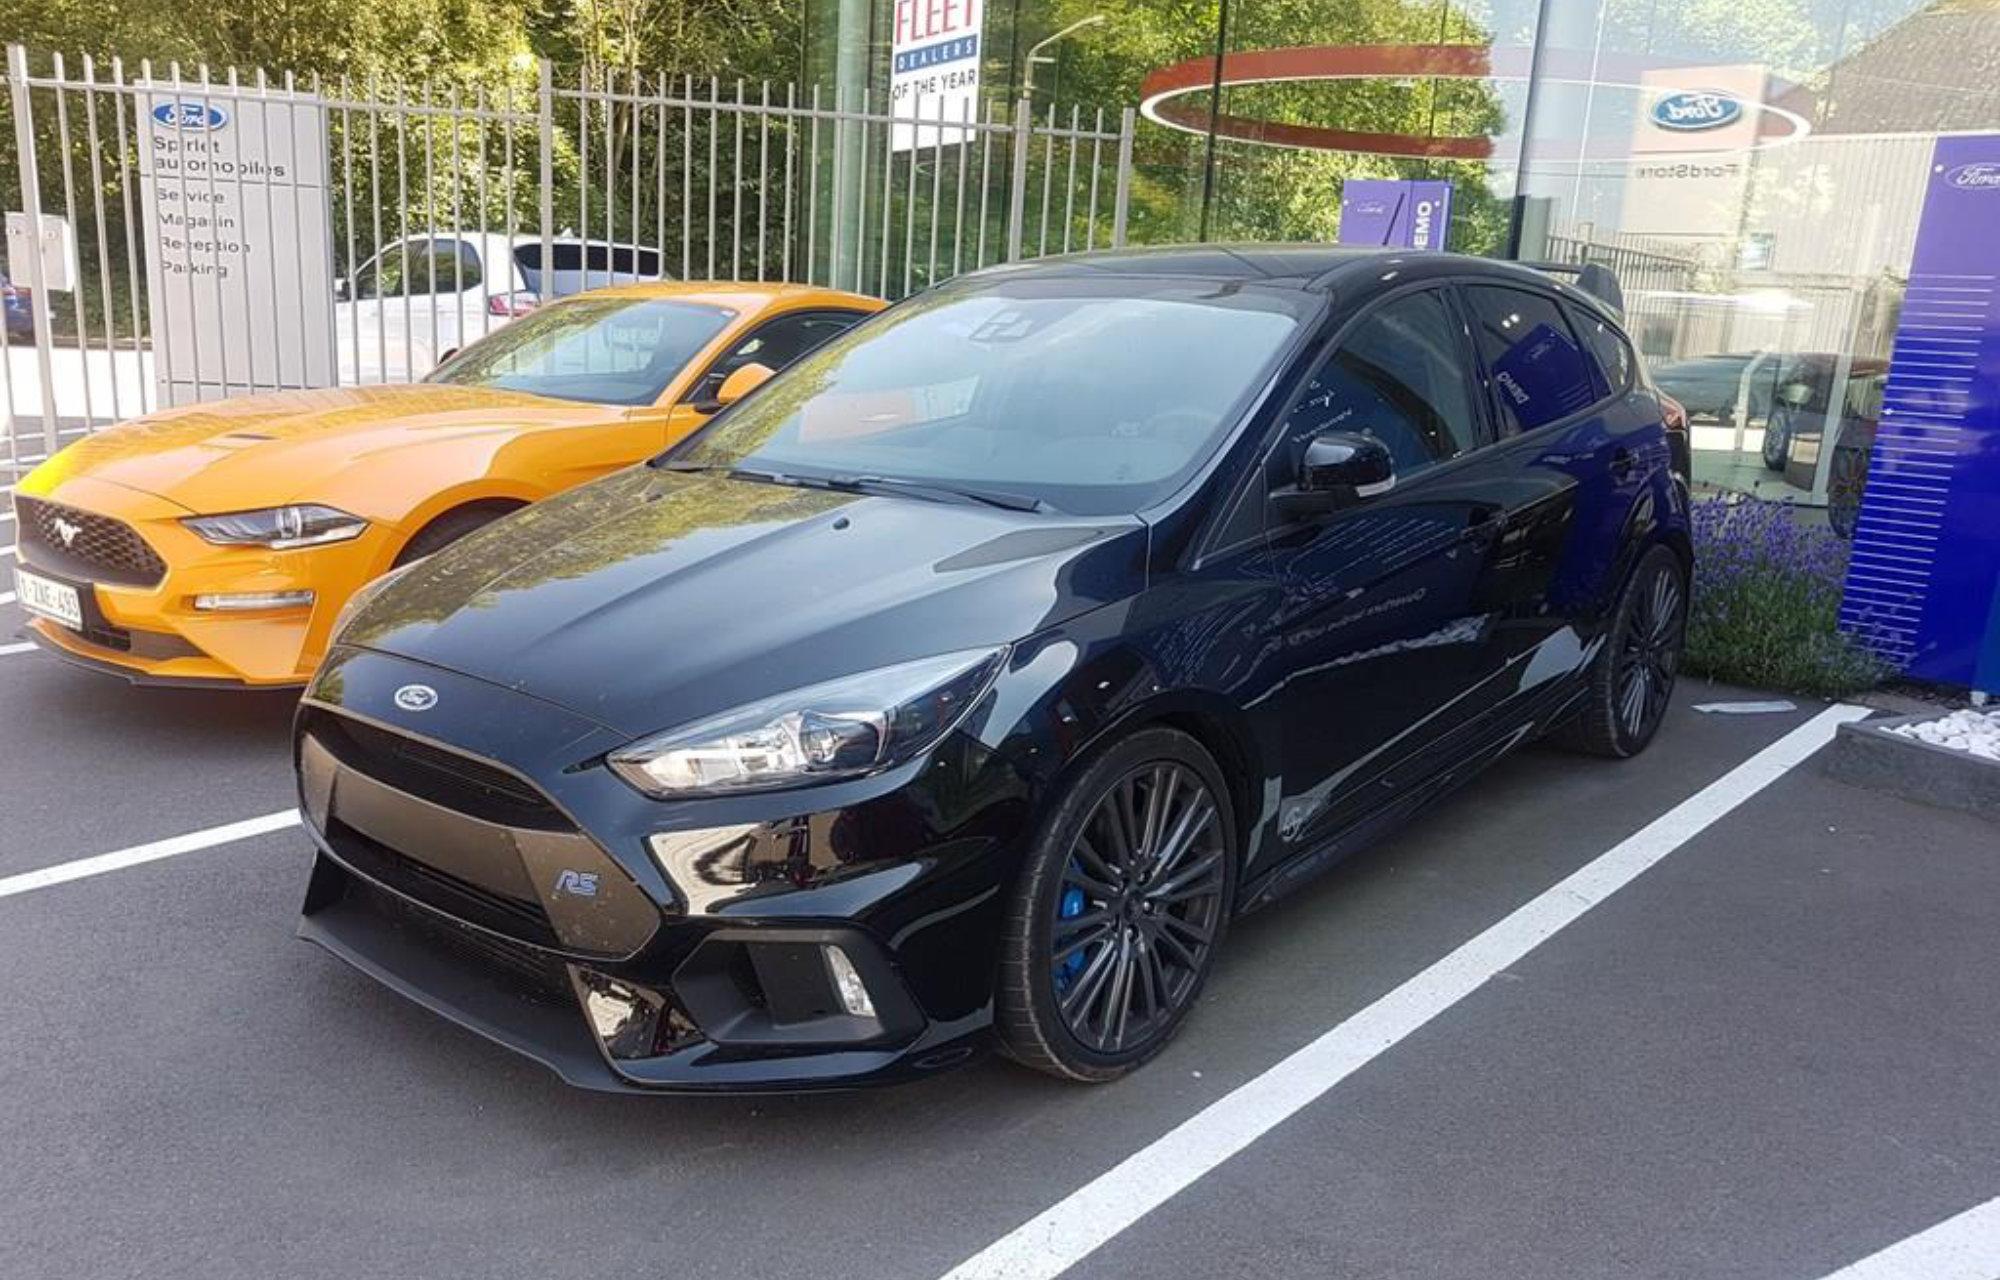 Ford Focus RS Spirletautomobiles